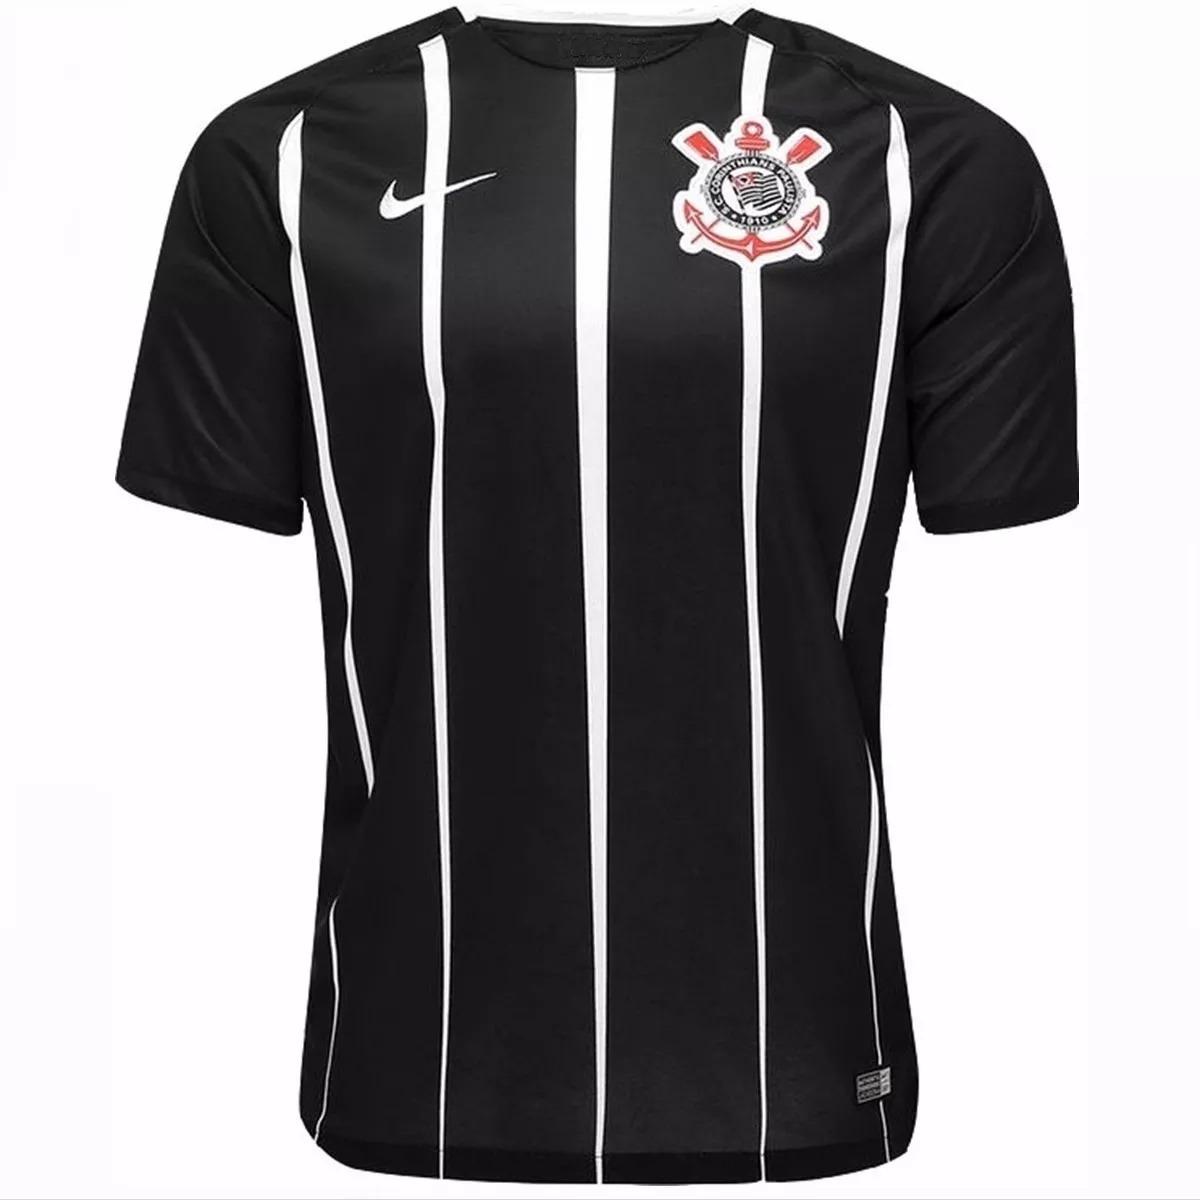 8cd2f677b721b Camisa Camiseta Futebol Corinthians Masculina Timão 2018 - R  54